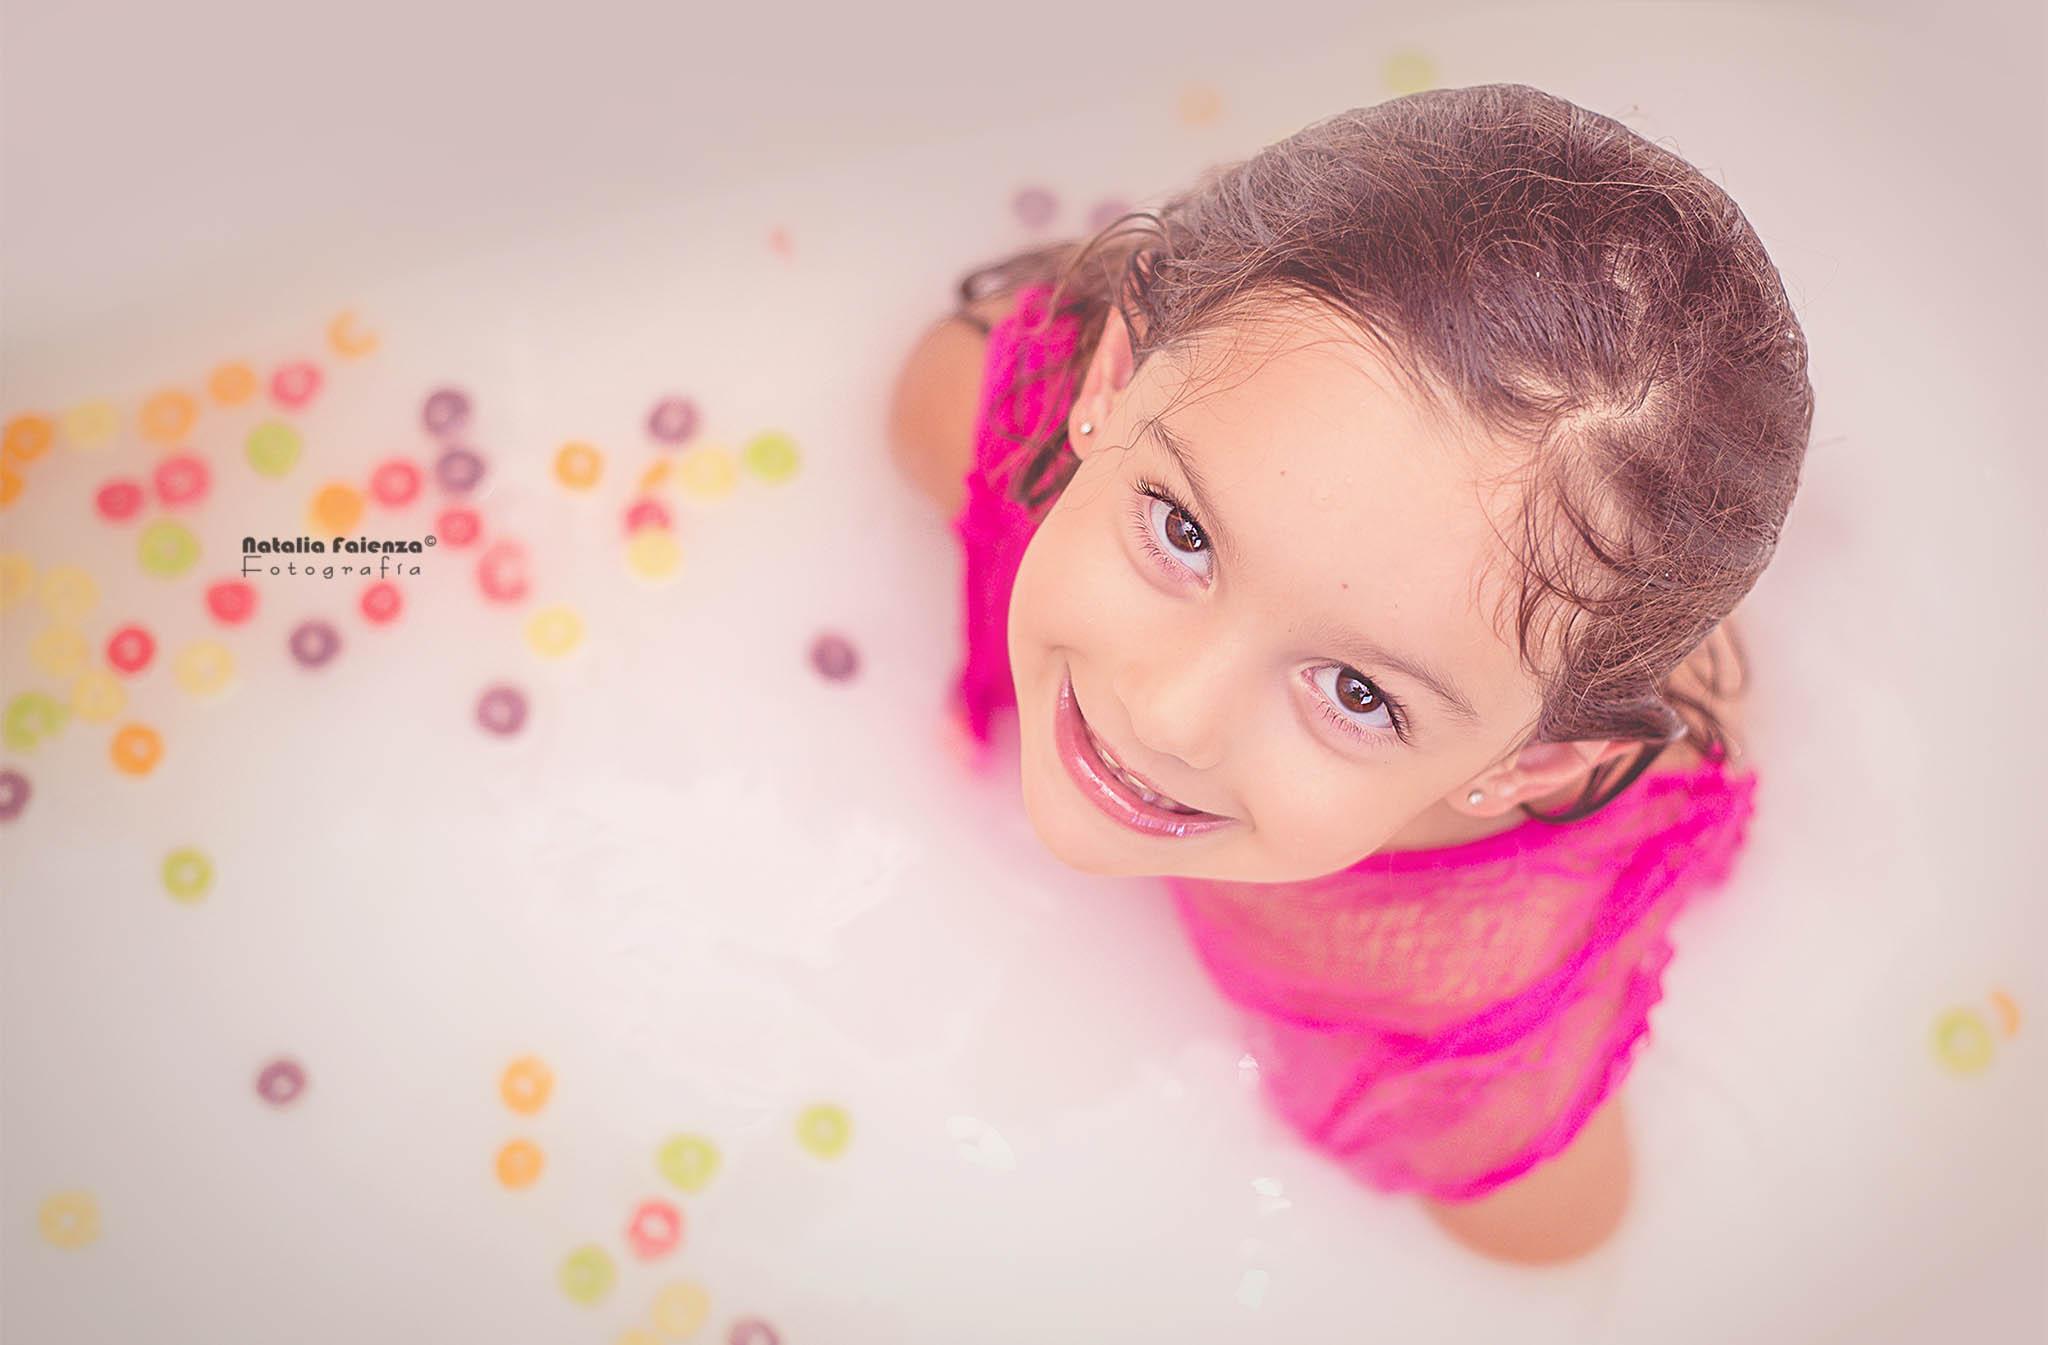 milk_bath_fotografía_workshop_natalia_faienza_6_